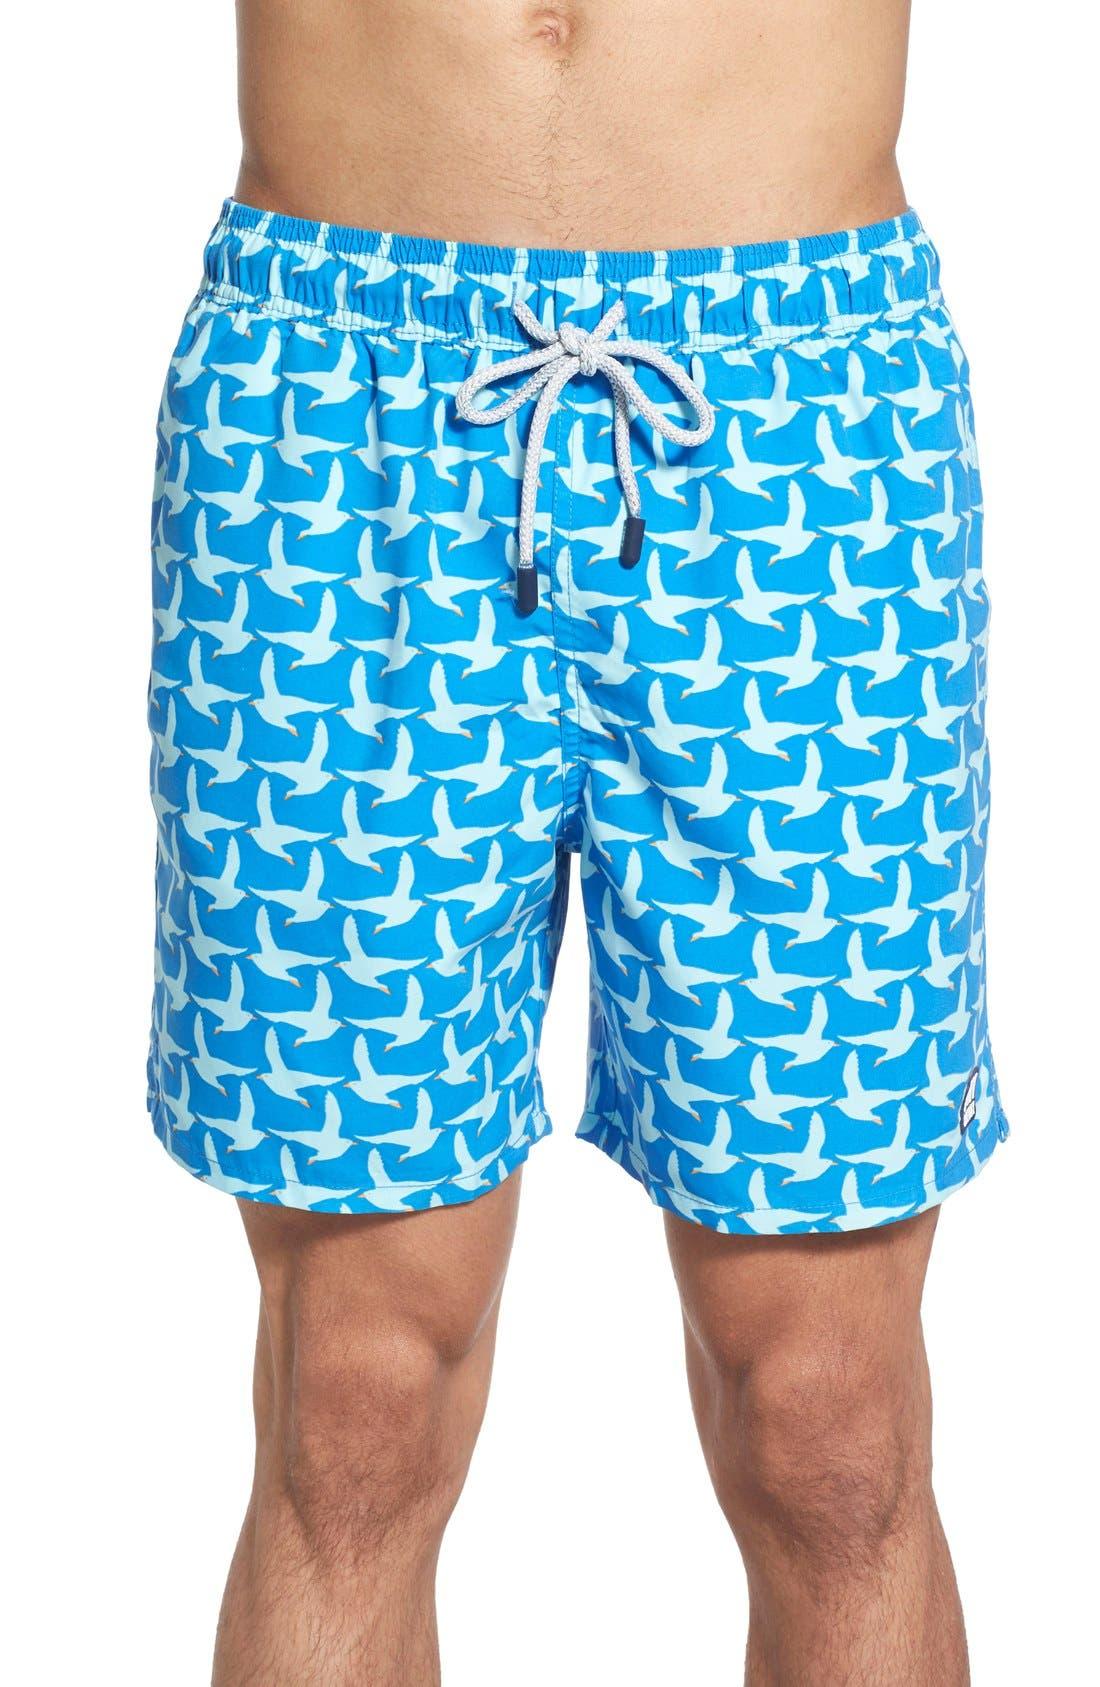 Tom & Teddy Seagull Print Swim Trunks, Blue